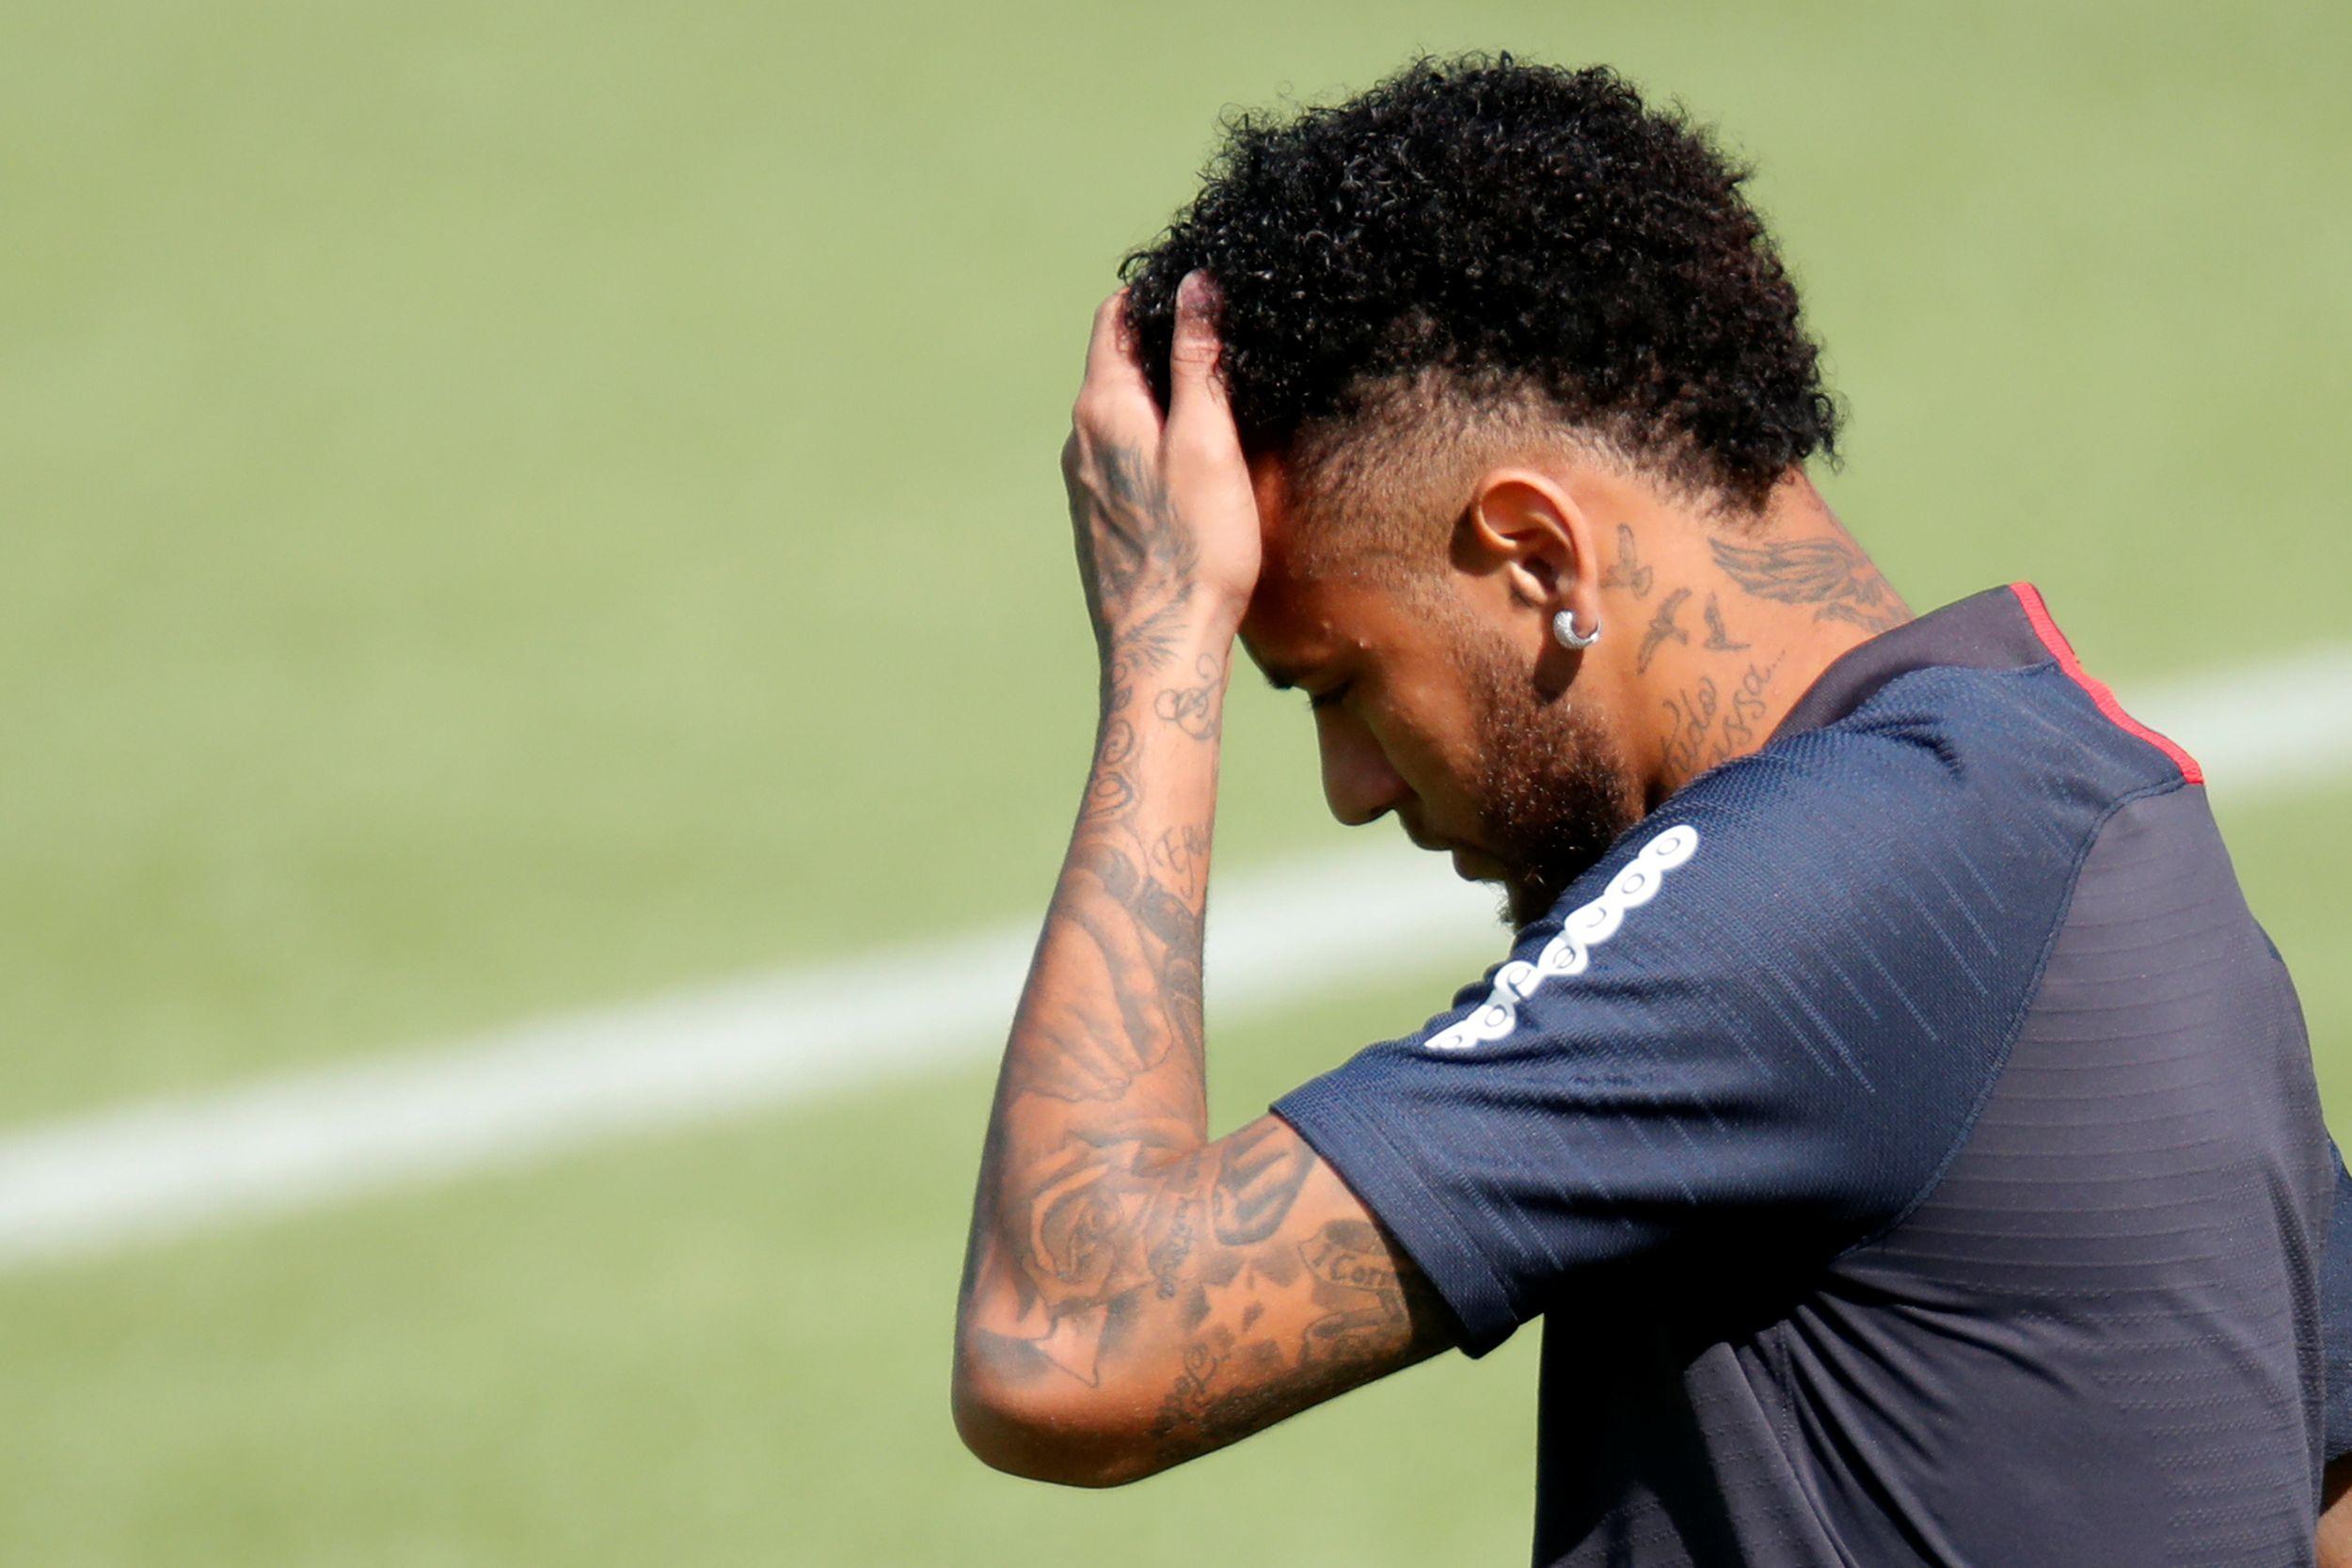 Football - Transferts - Neymar, l'épilogue du feuilleton en questions